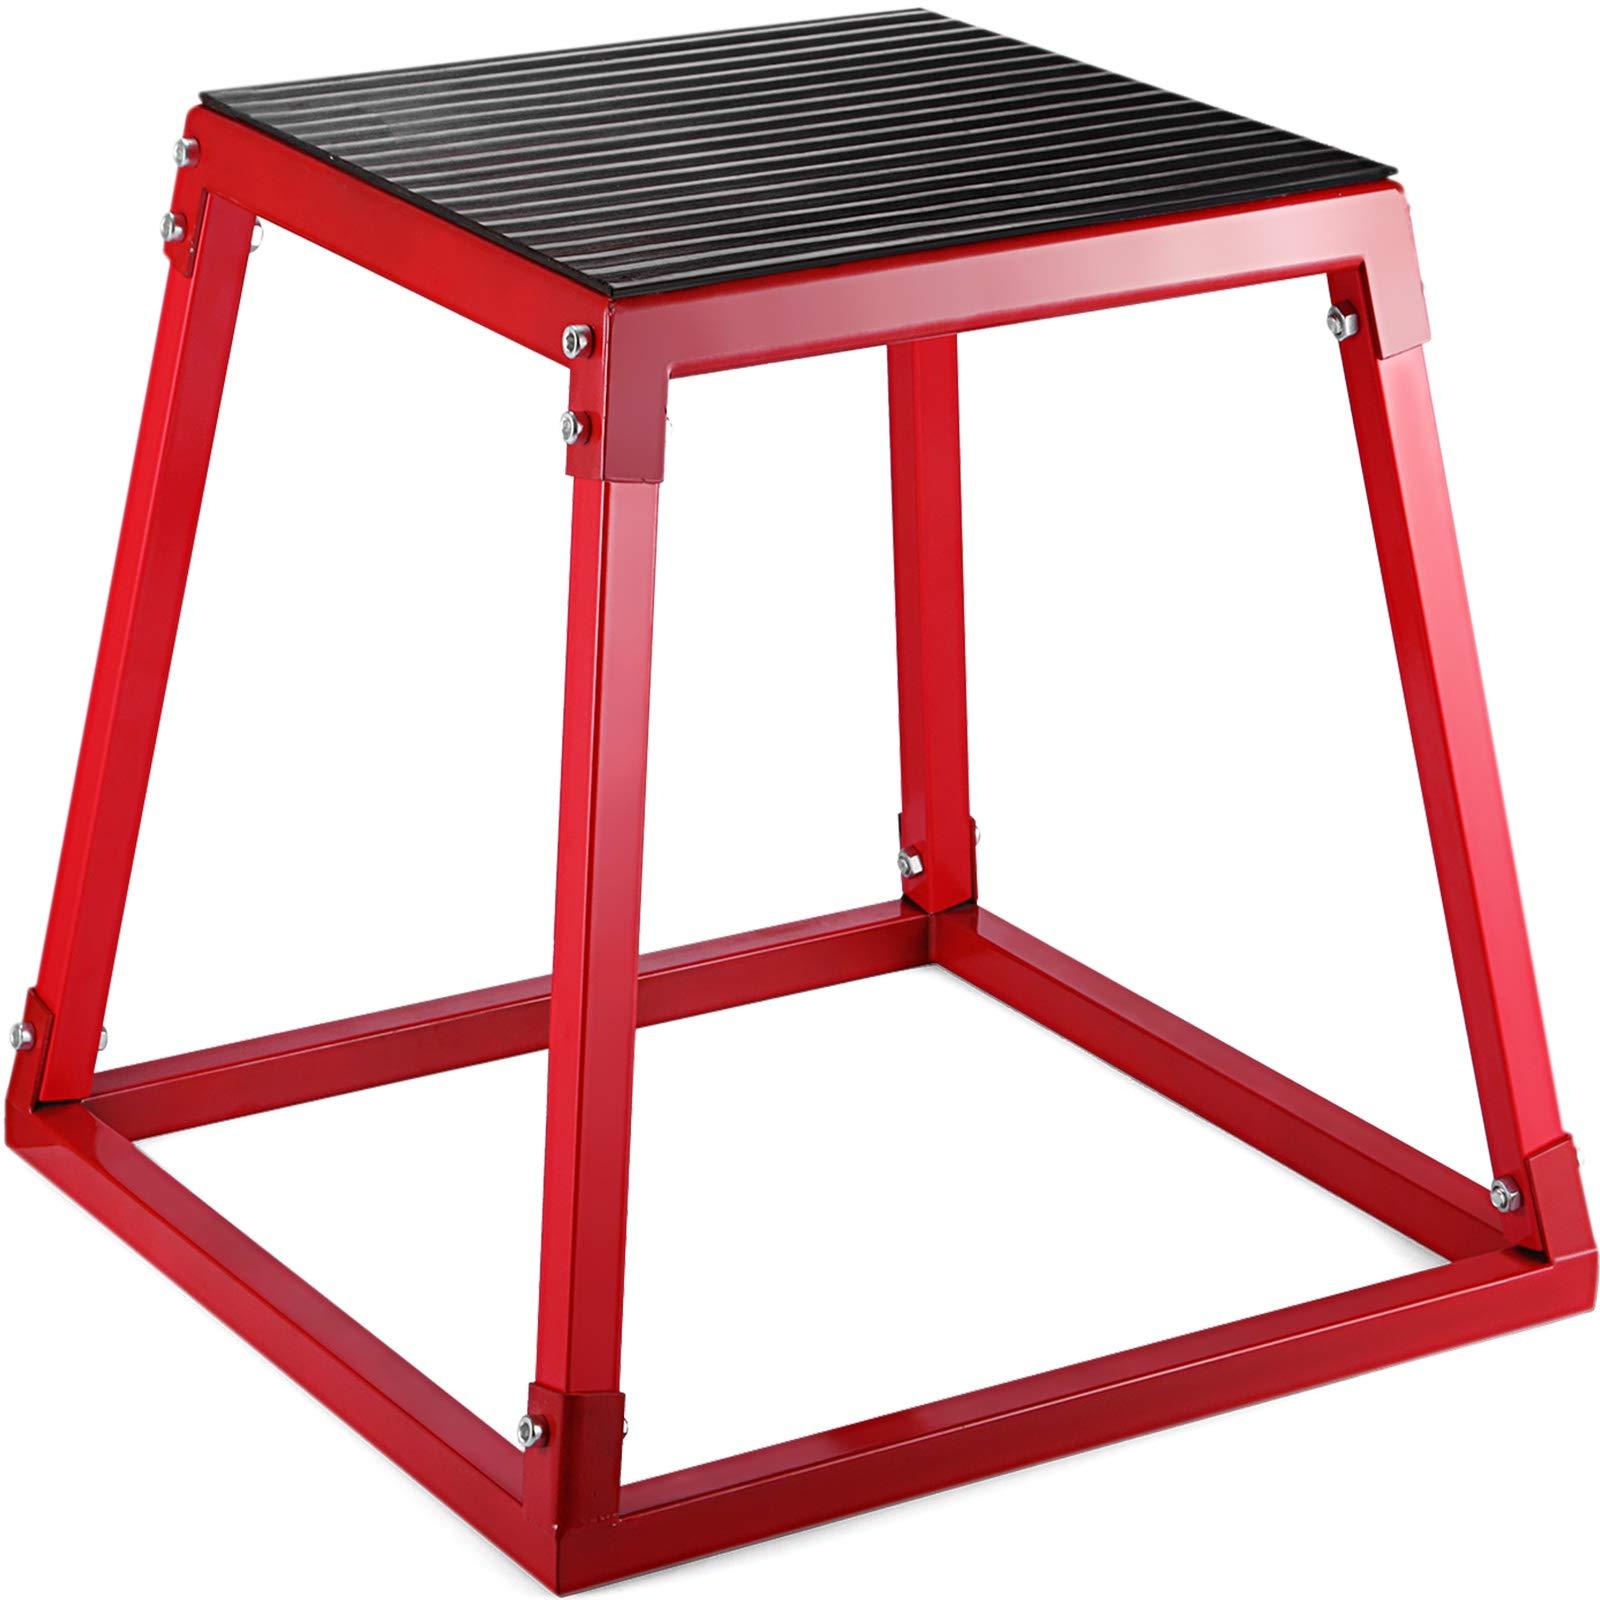 VEVOR Jumping Box 30'' Platform Jump Box Exercise Plyometric Jump Boxes for Jump Training(30'',Black)